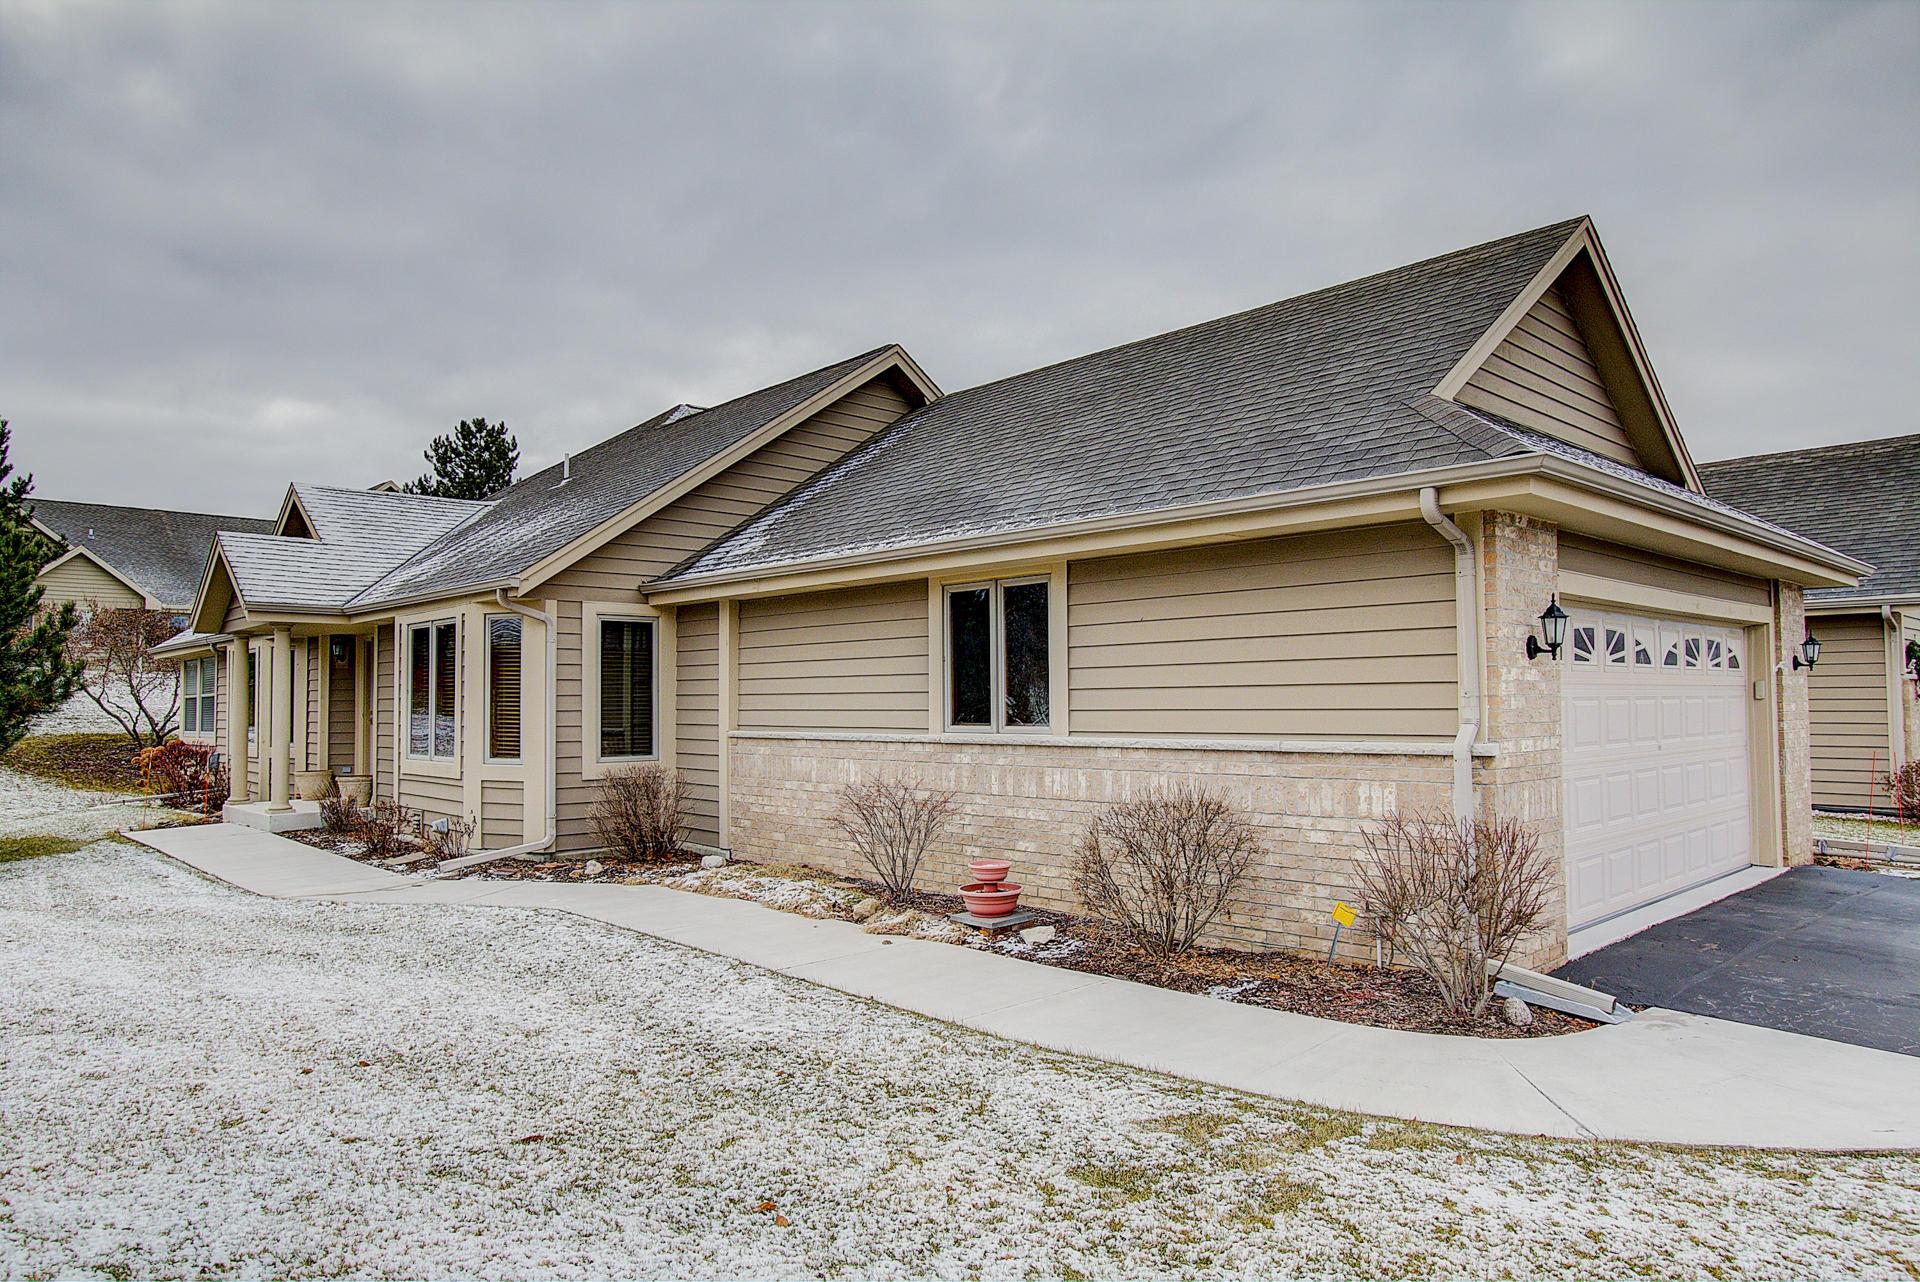 N21W24303 Parkway Meadow Cir, Pewaukee, Wisconsin 53072, 2 Bedrooms Bedrooms, 12 Rooms Rooms,3 BathroomsBathrooms,Condominiums,For Sale,Parkway Meadow Cir,1,1616123